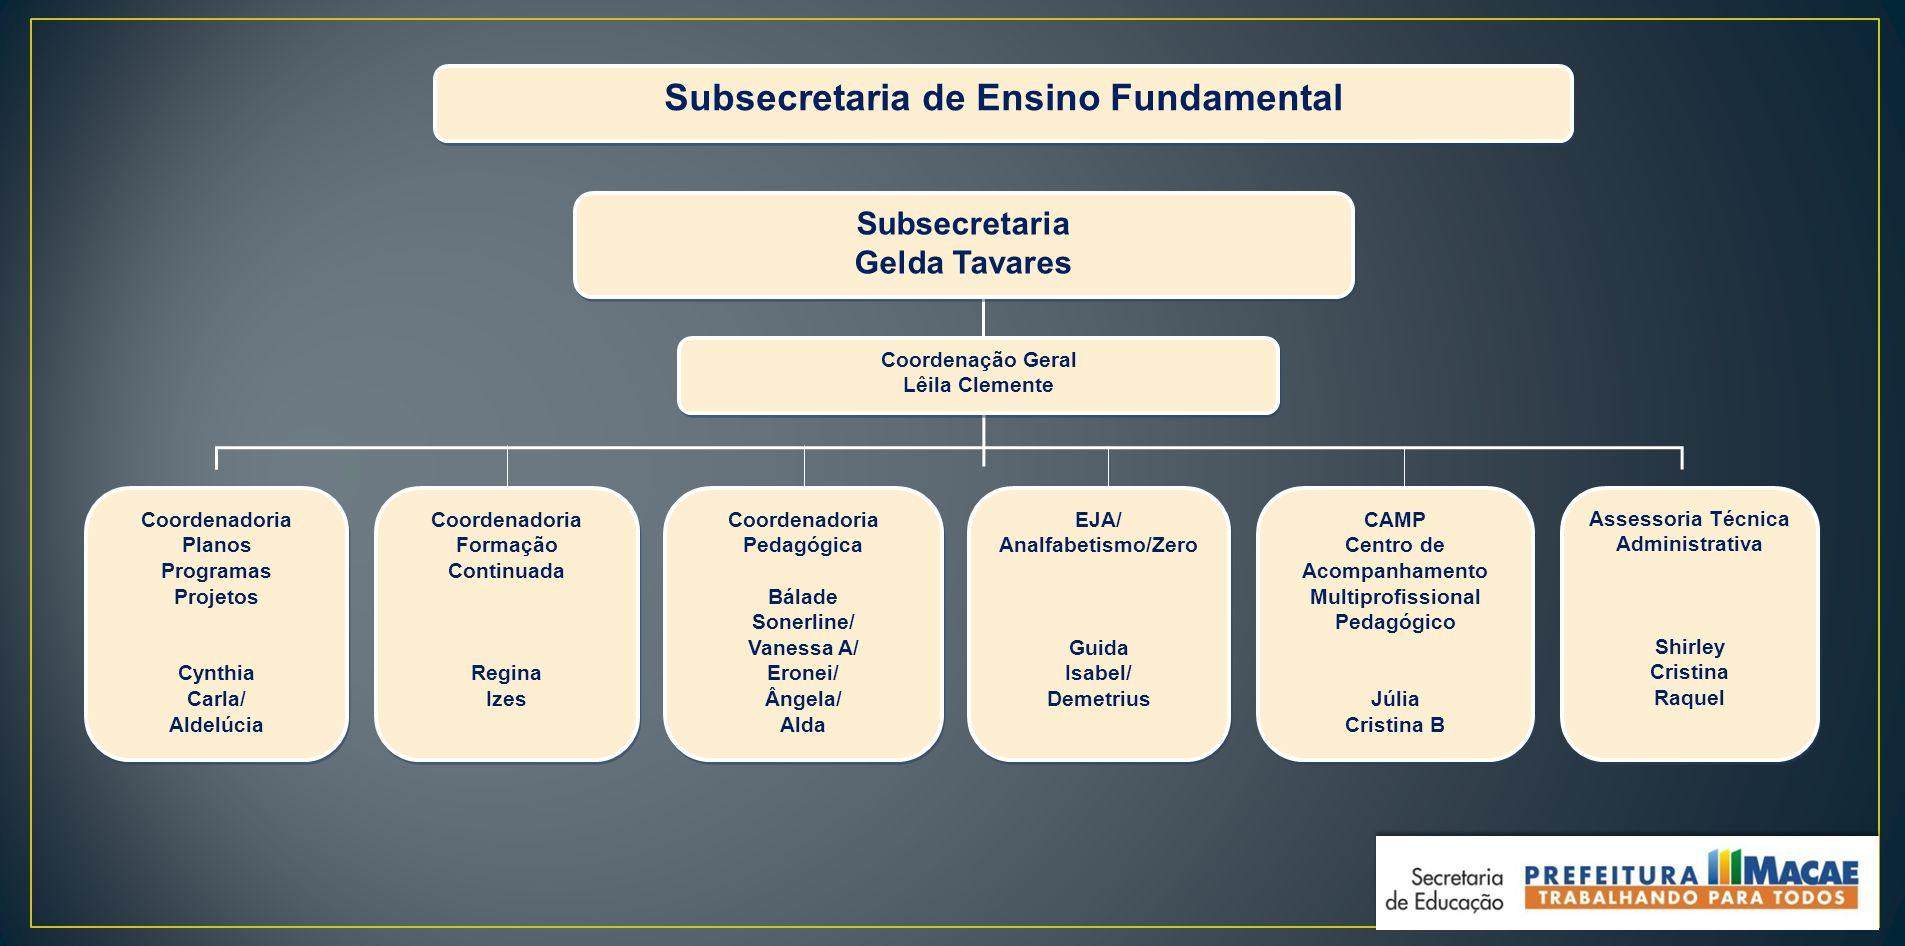 Subsecretaria de Ensino Fundamental